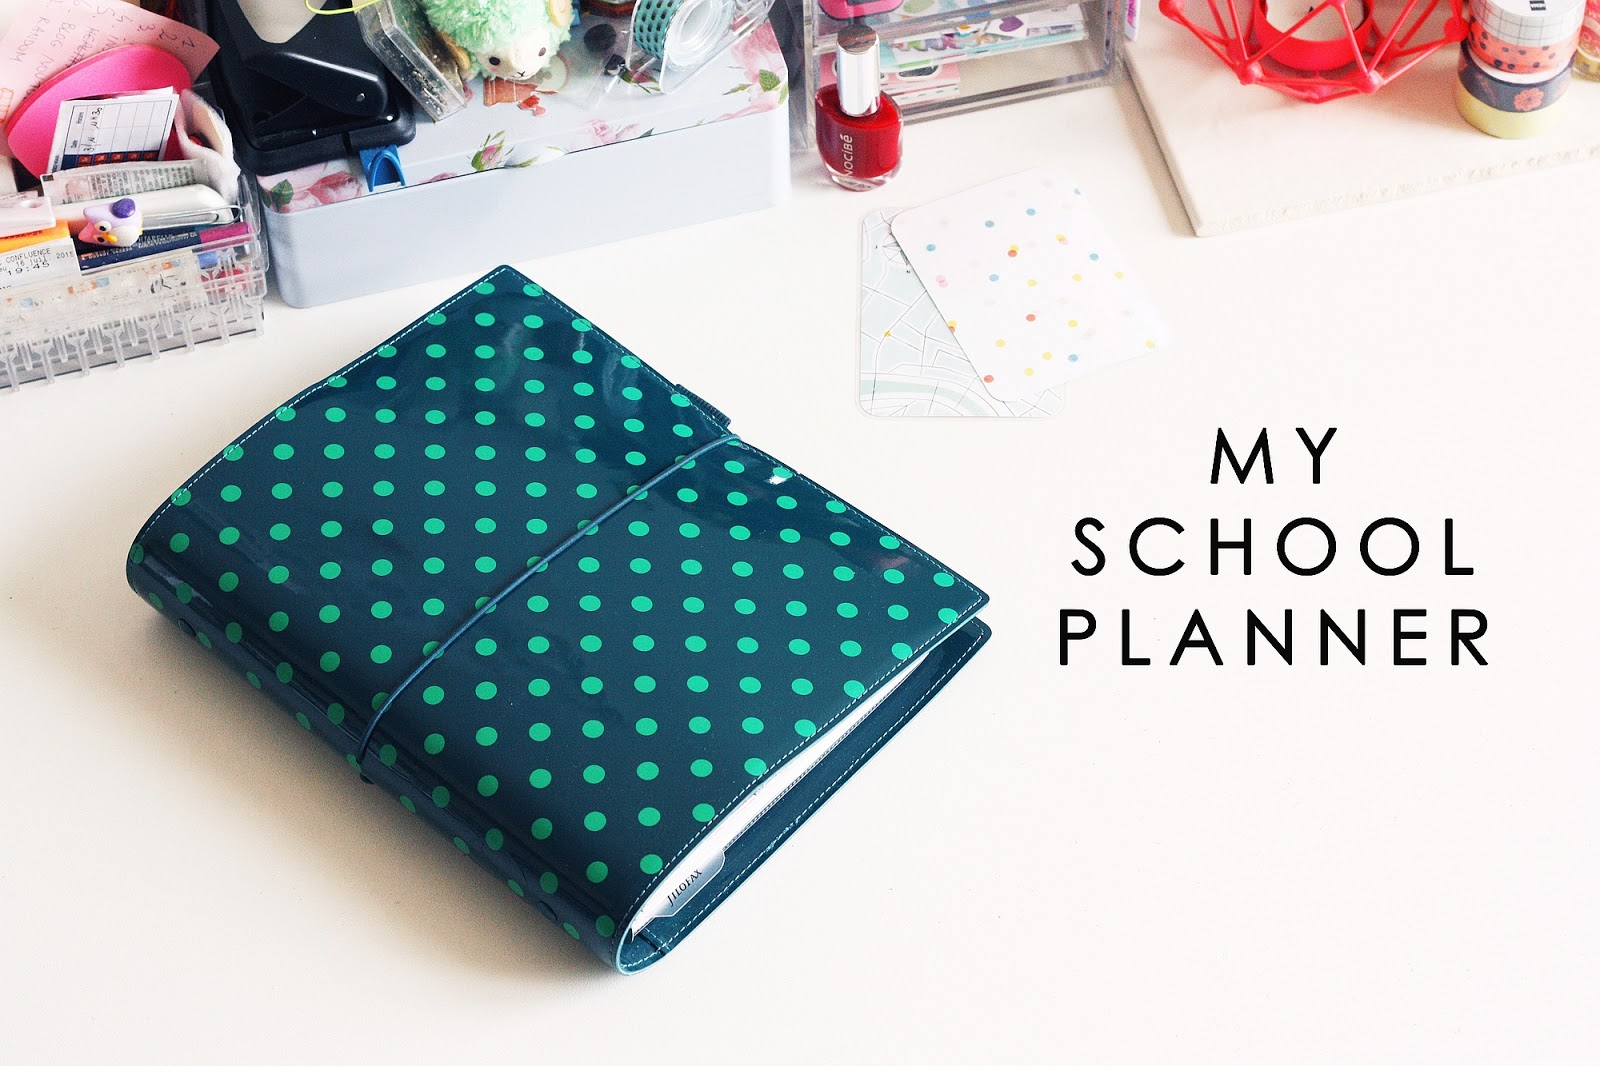 http://audreymarianne.blogspot.com/2016/02/my-school-planner-filofax-domino-spots.html